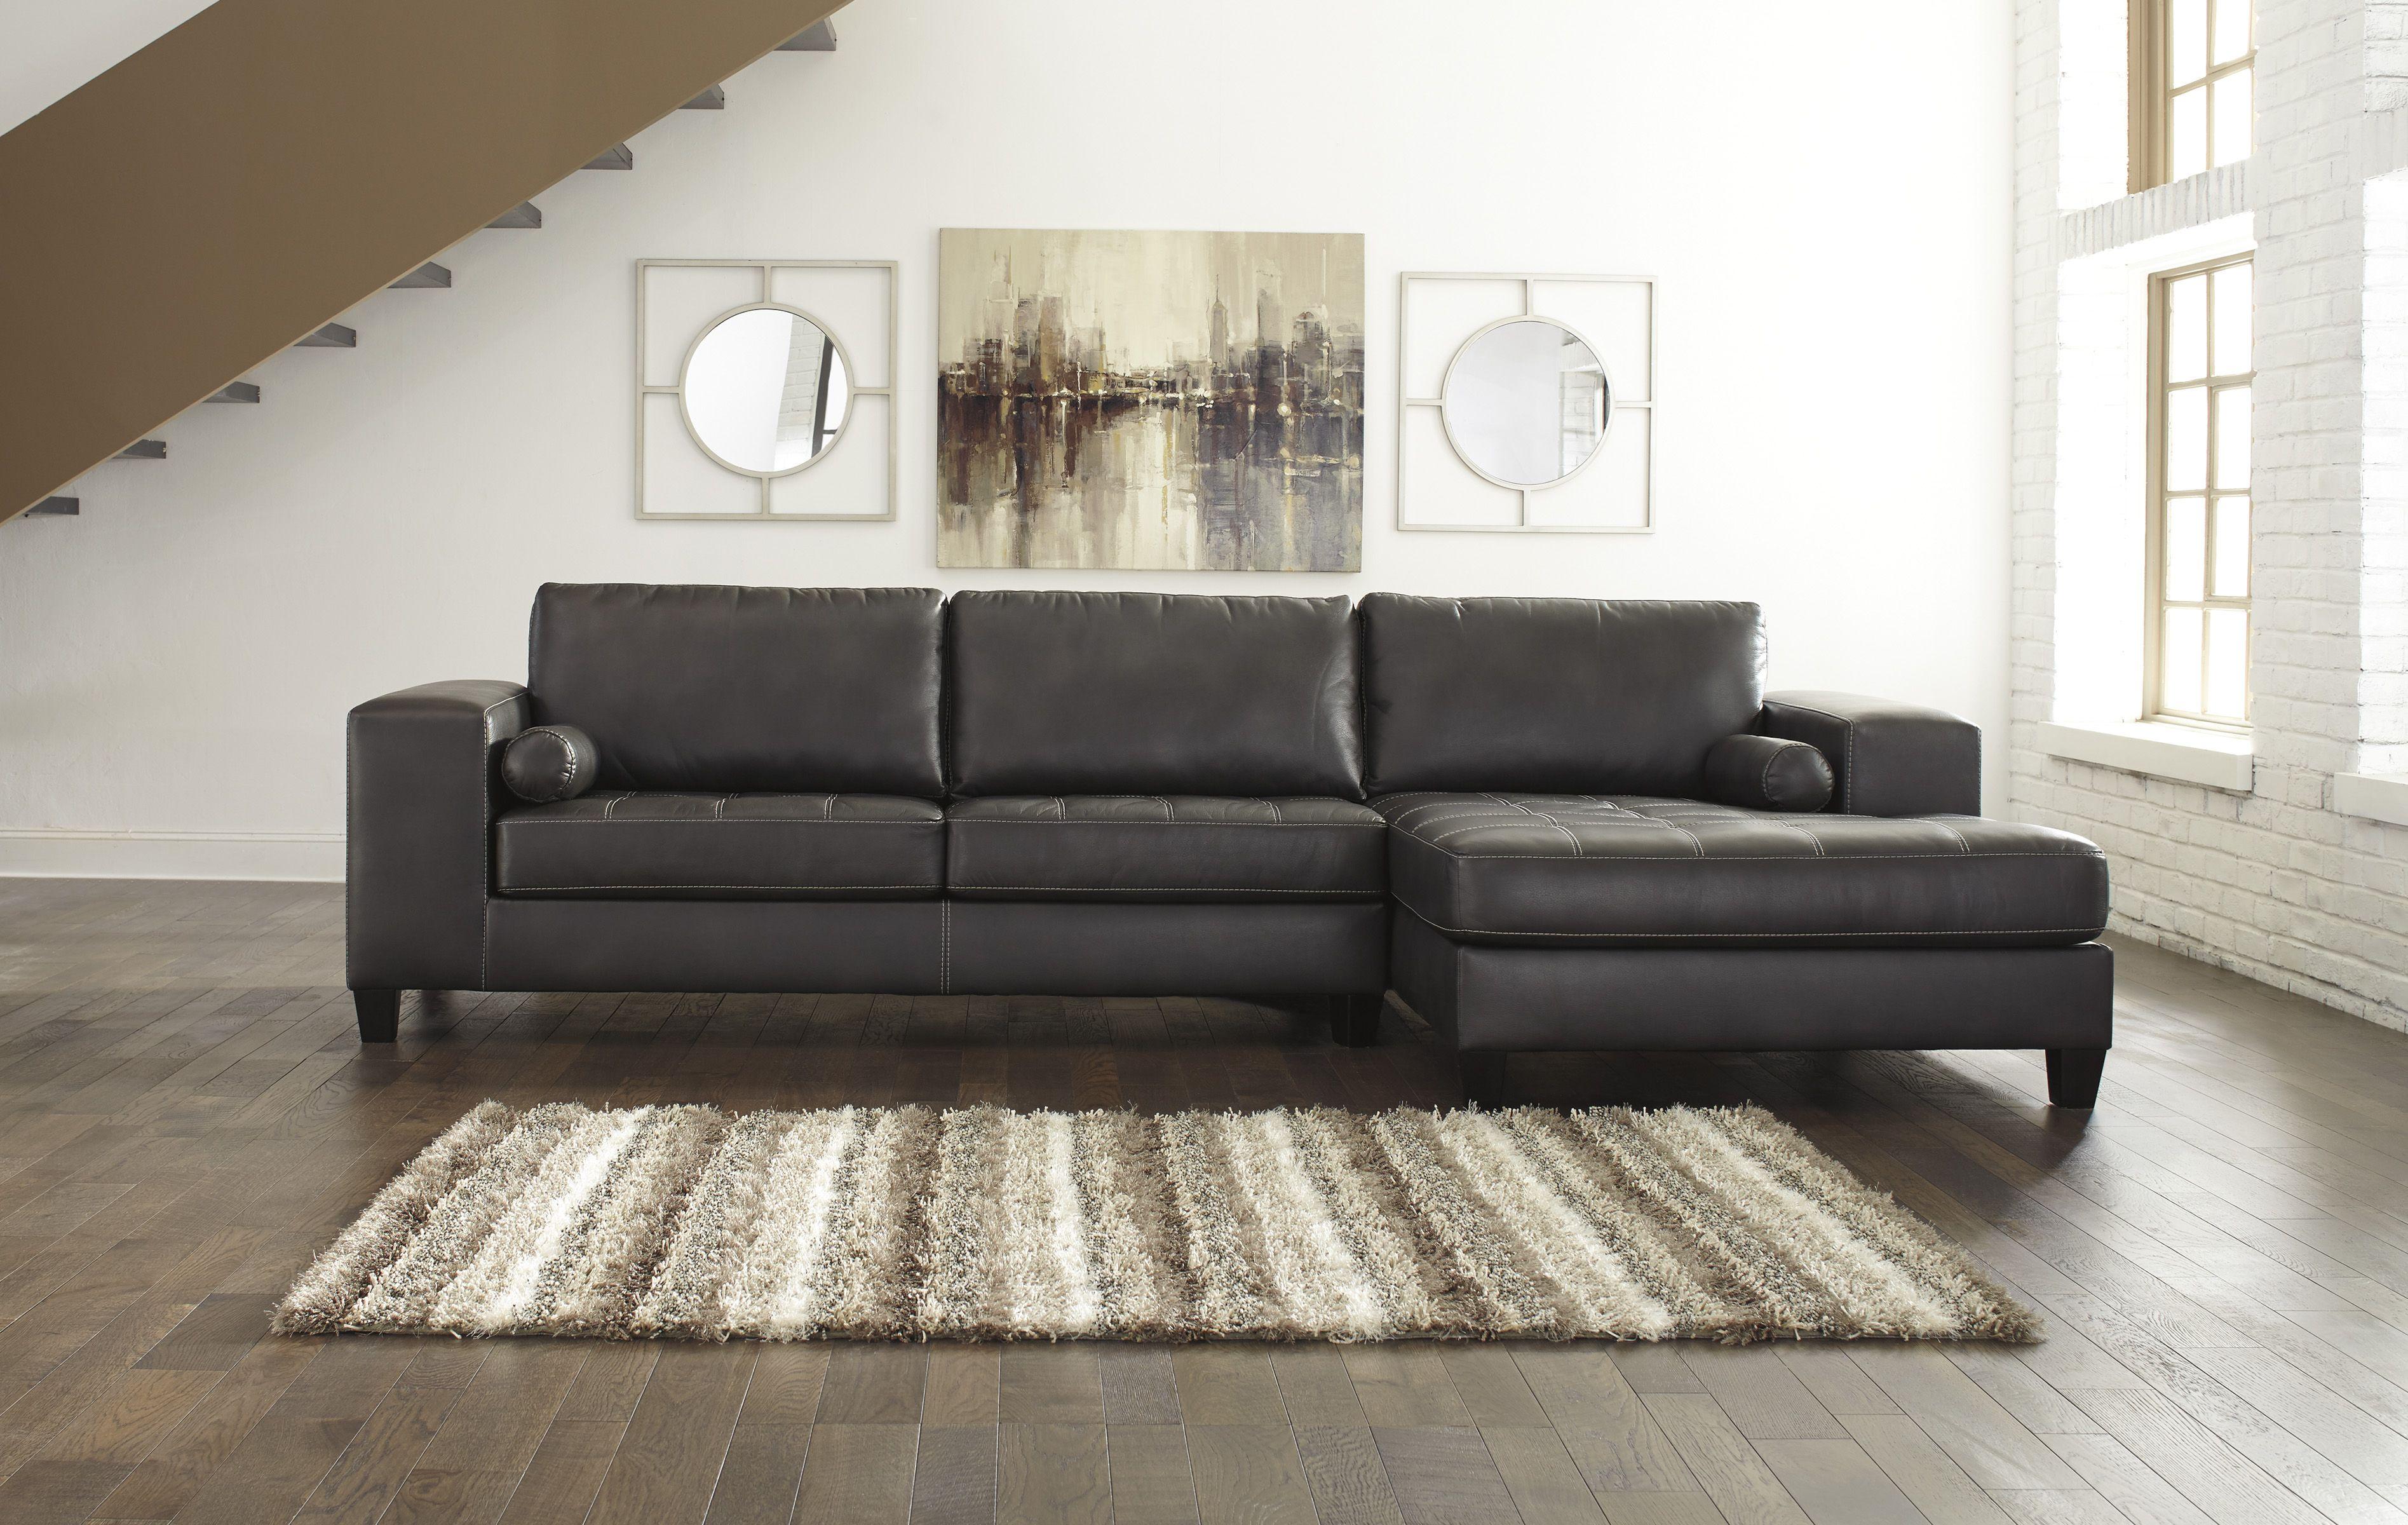 Nokomis Charcoal 87701 17 By Ashley Sectional Sofa Sectional Sofa Couch Ashley Furniture Sectional Sectional